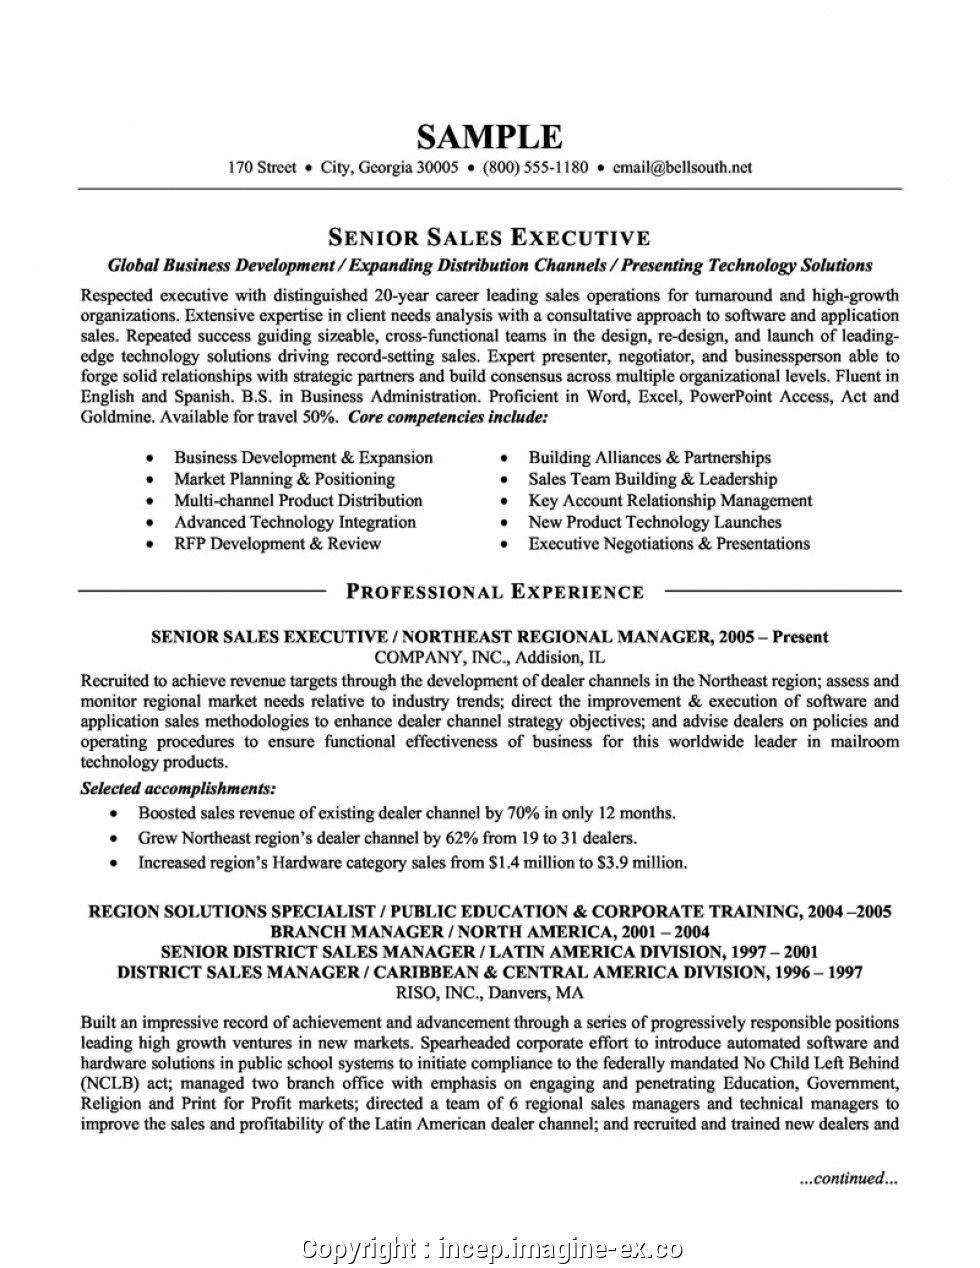 Senior Sales Executive Sample Resume Senior Sales Executive Sample Resume Senior Sales Executive Resume Samples Jobhero Senior Sales Executives Are Experienc